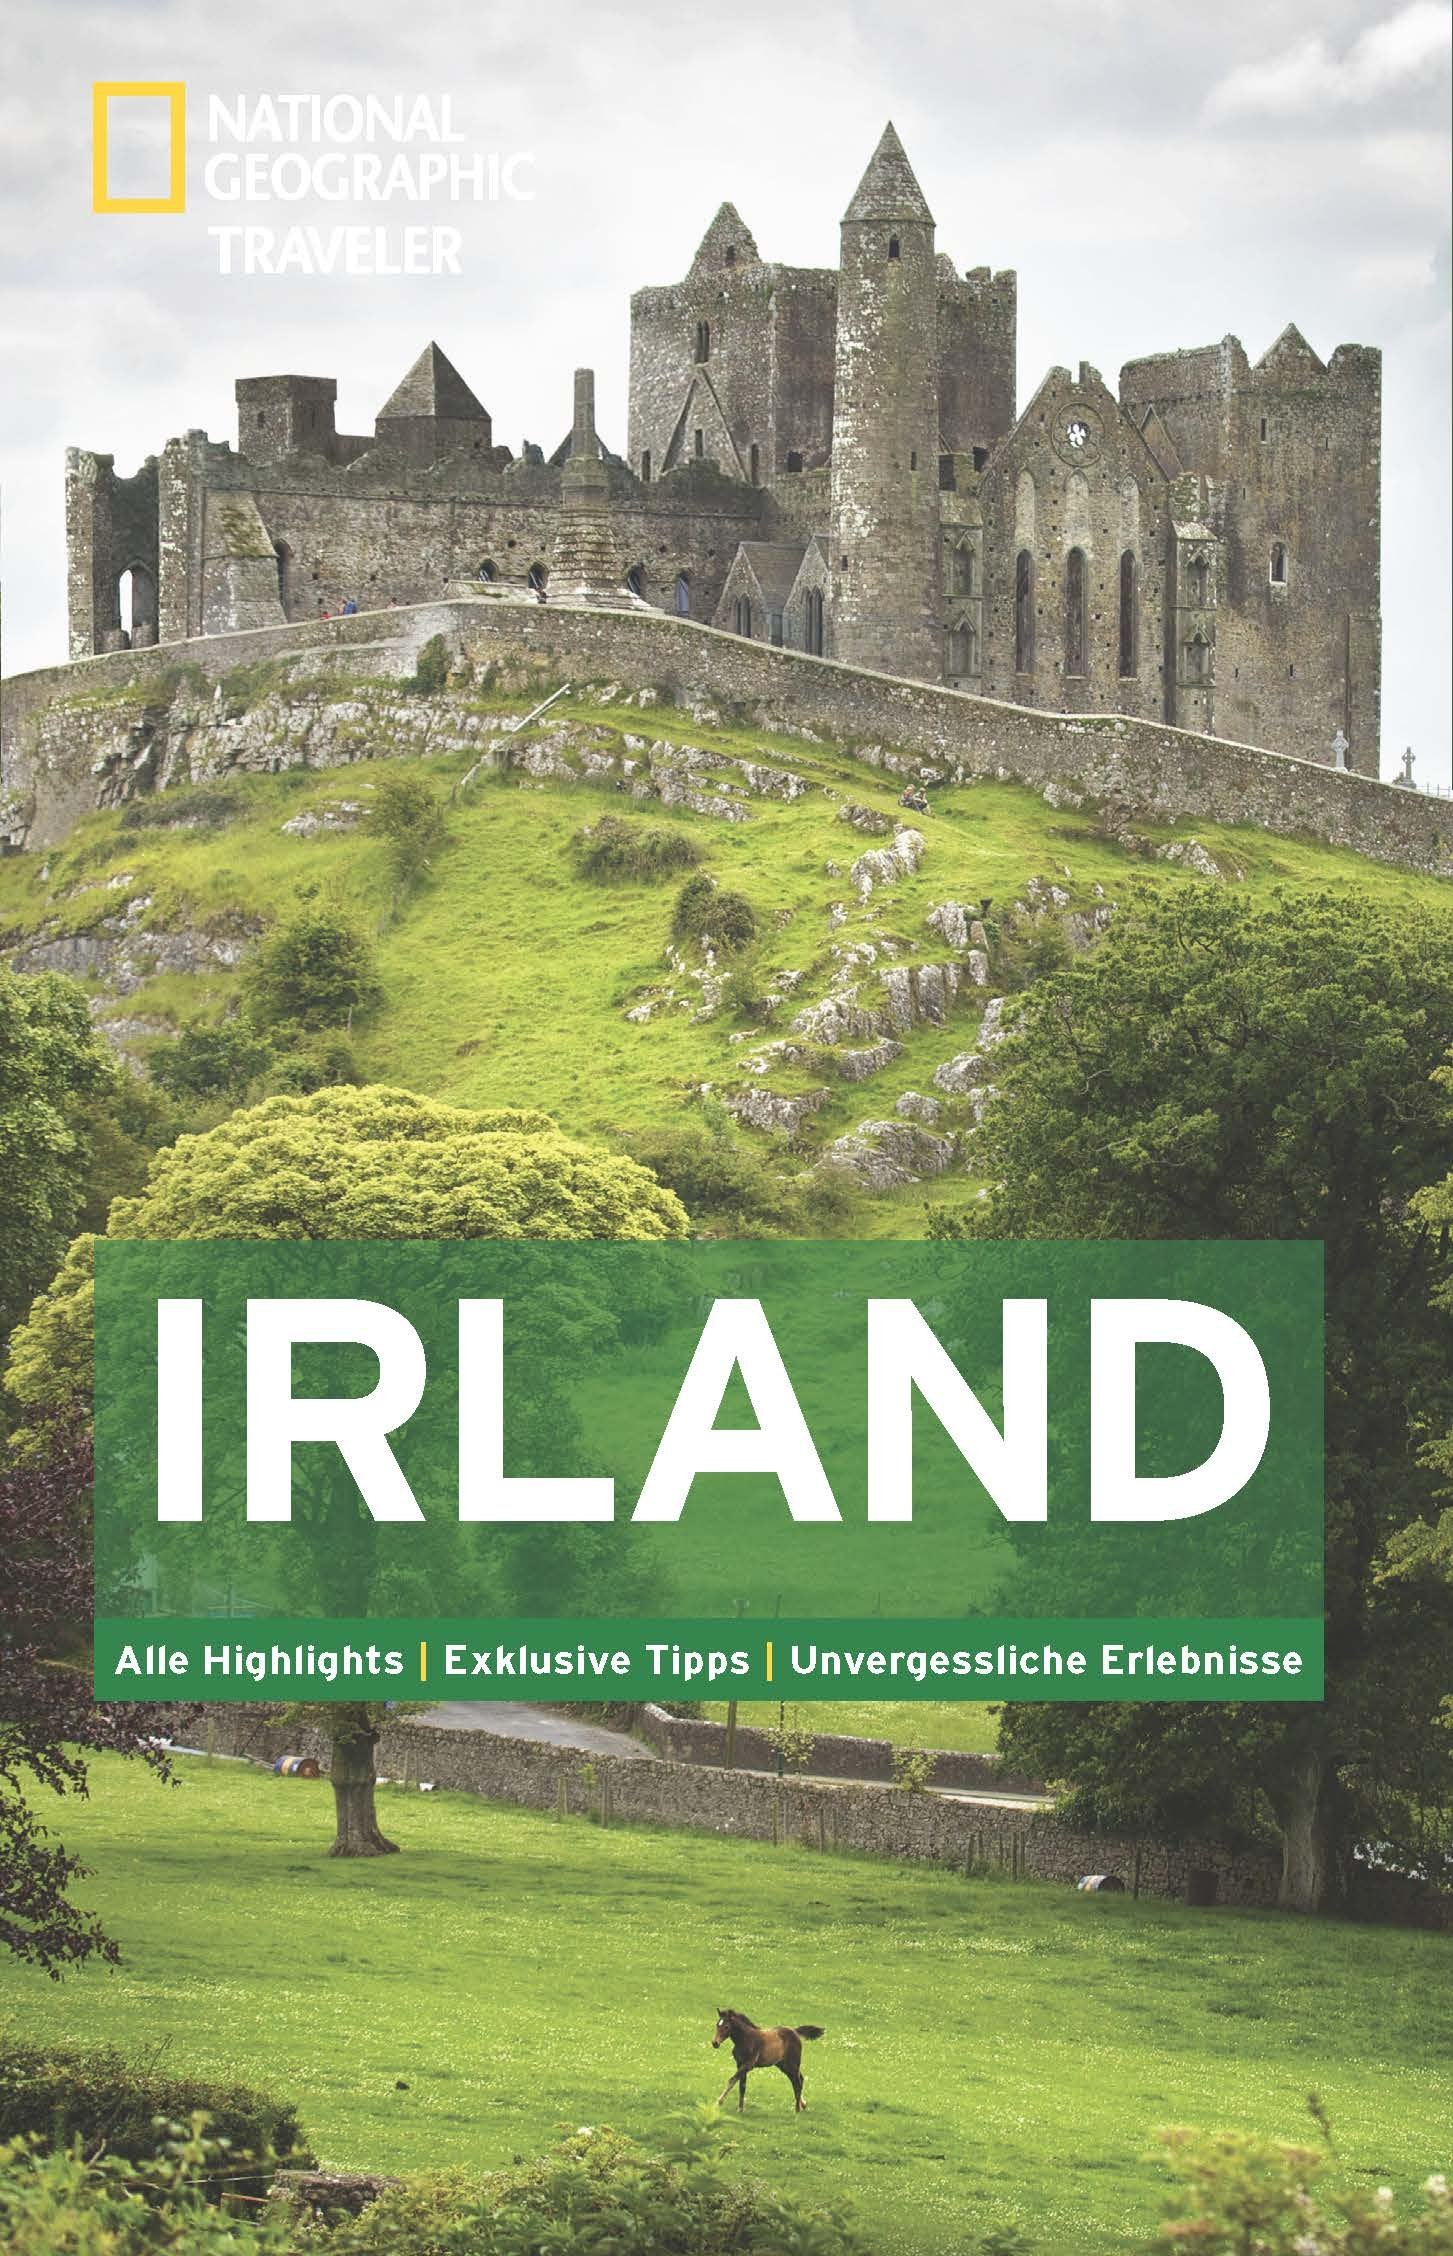 NATIONAL GEOGRAPHIC Traveler Irland: Amazon.de: Bücher